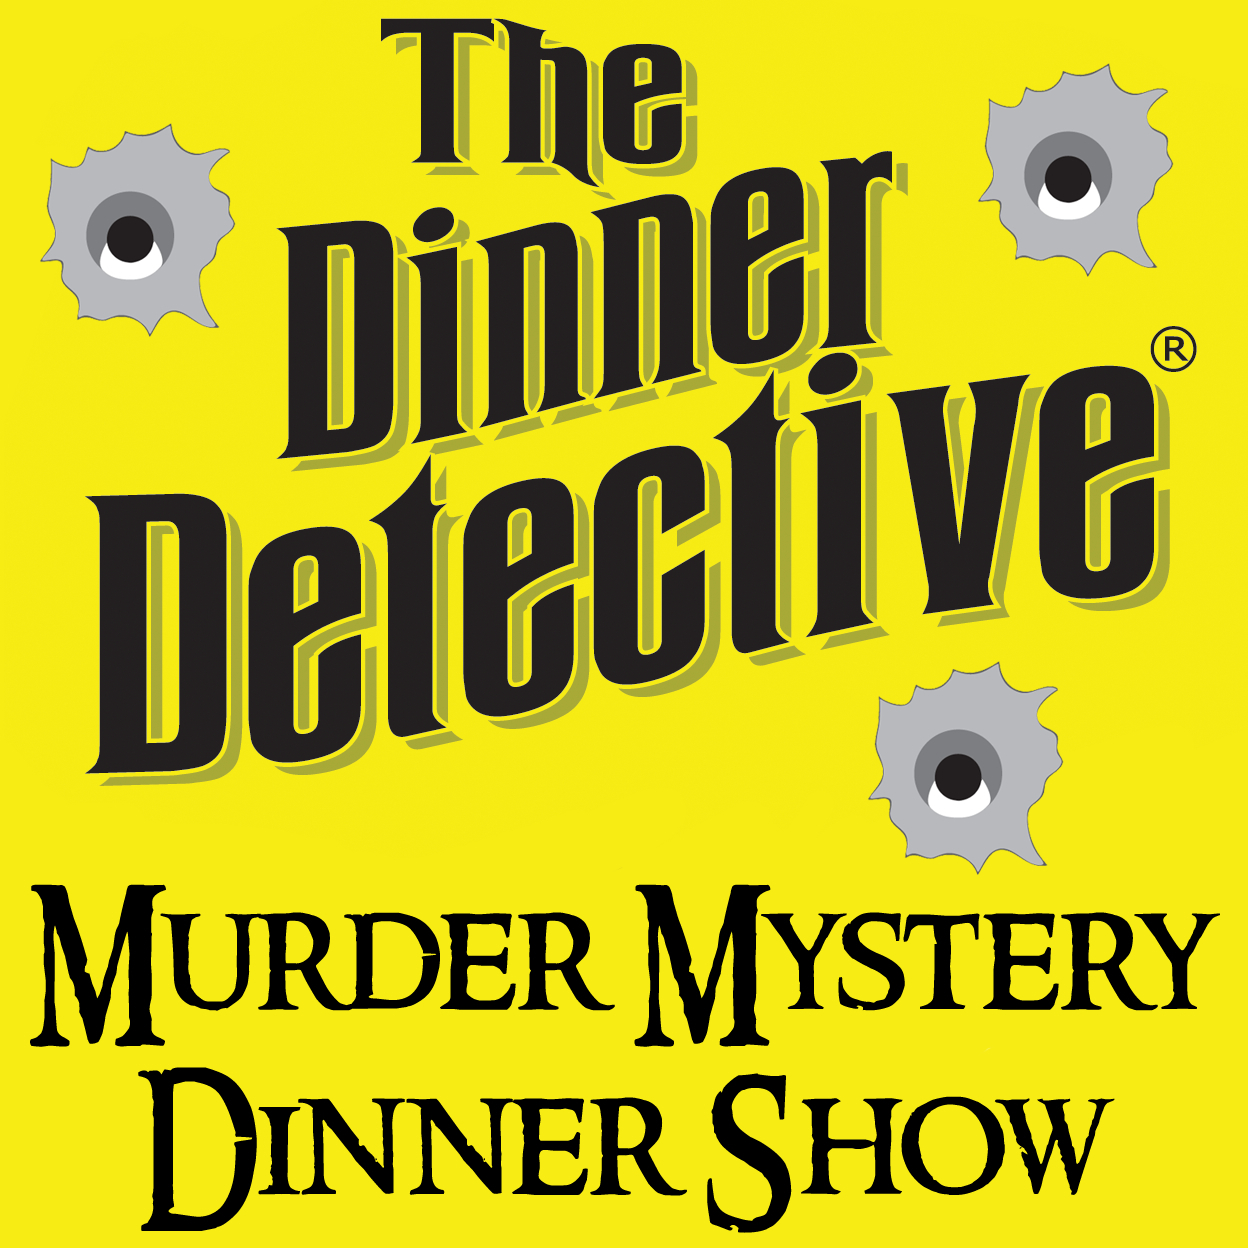 The Dinner Detective Interactive Murder Mystery Dinner Show - Atlanta, GA